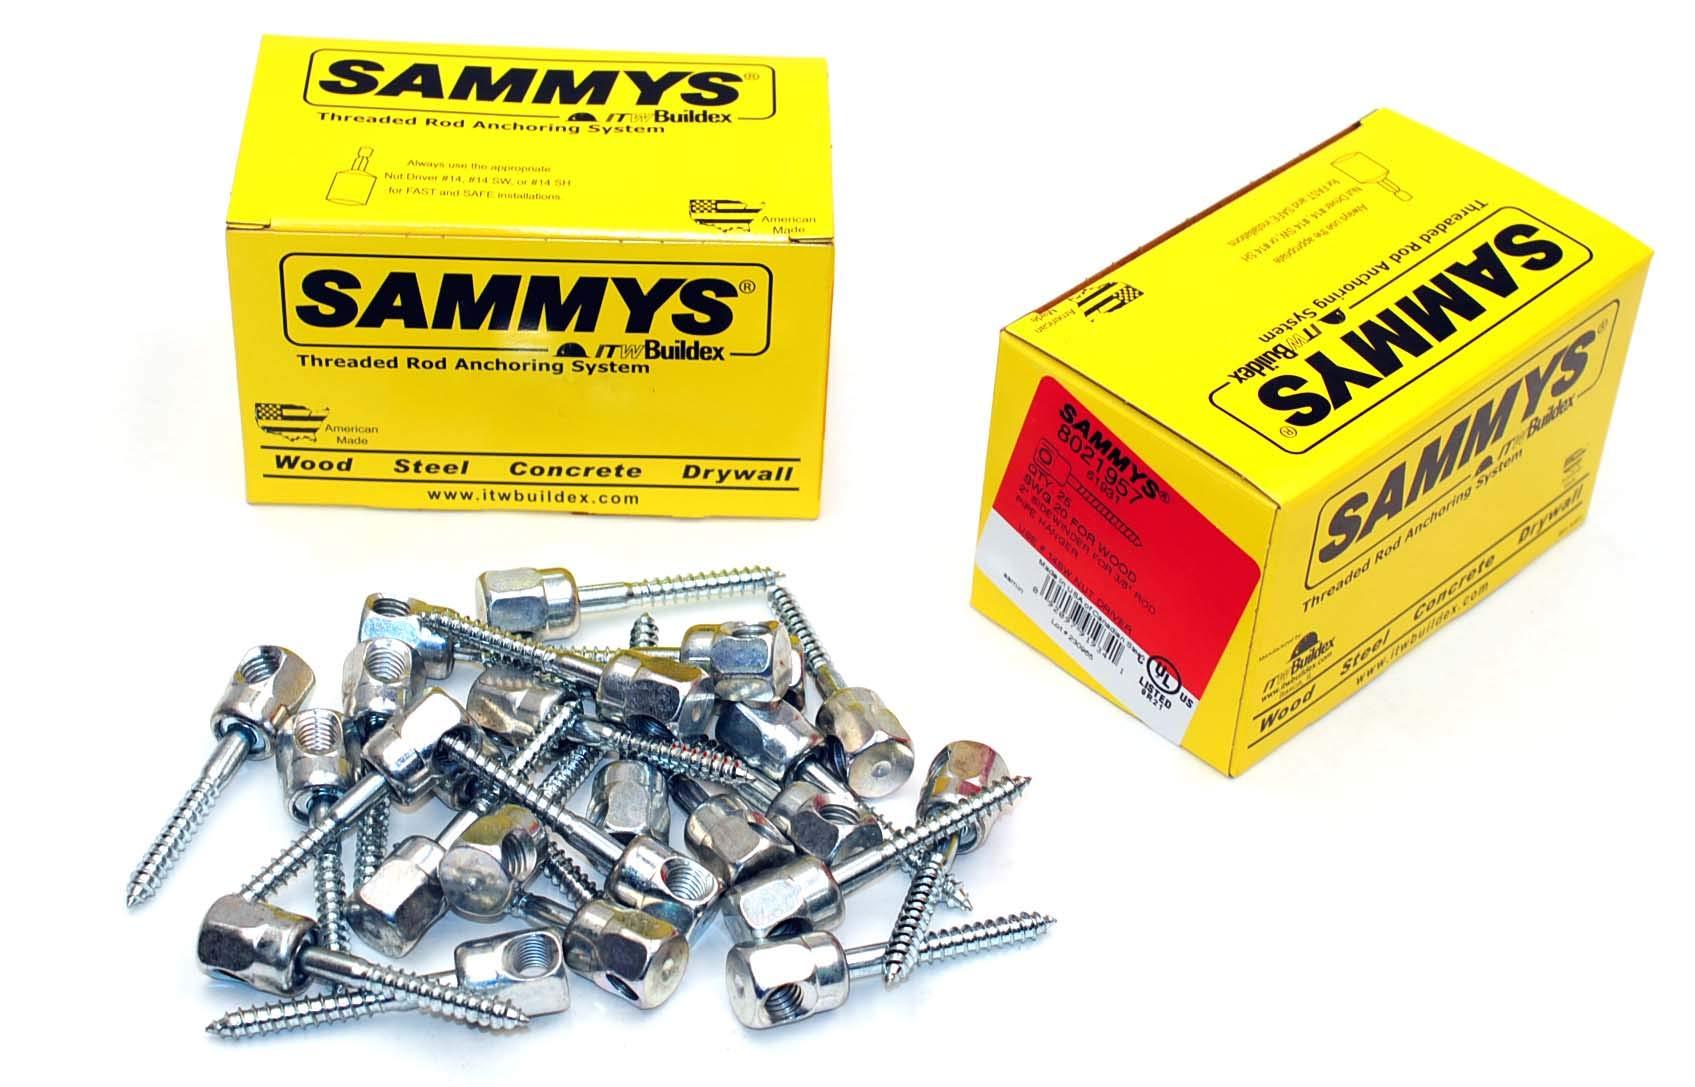 (25) Sammys 3/8-16 x 2 Sidewinder Threaded Rod Hanger for Wood 8021957 by Lexar Industrial